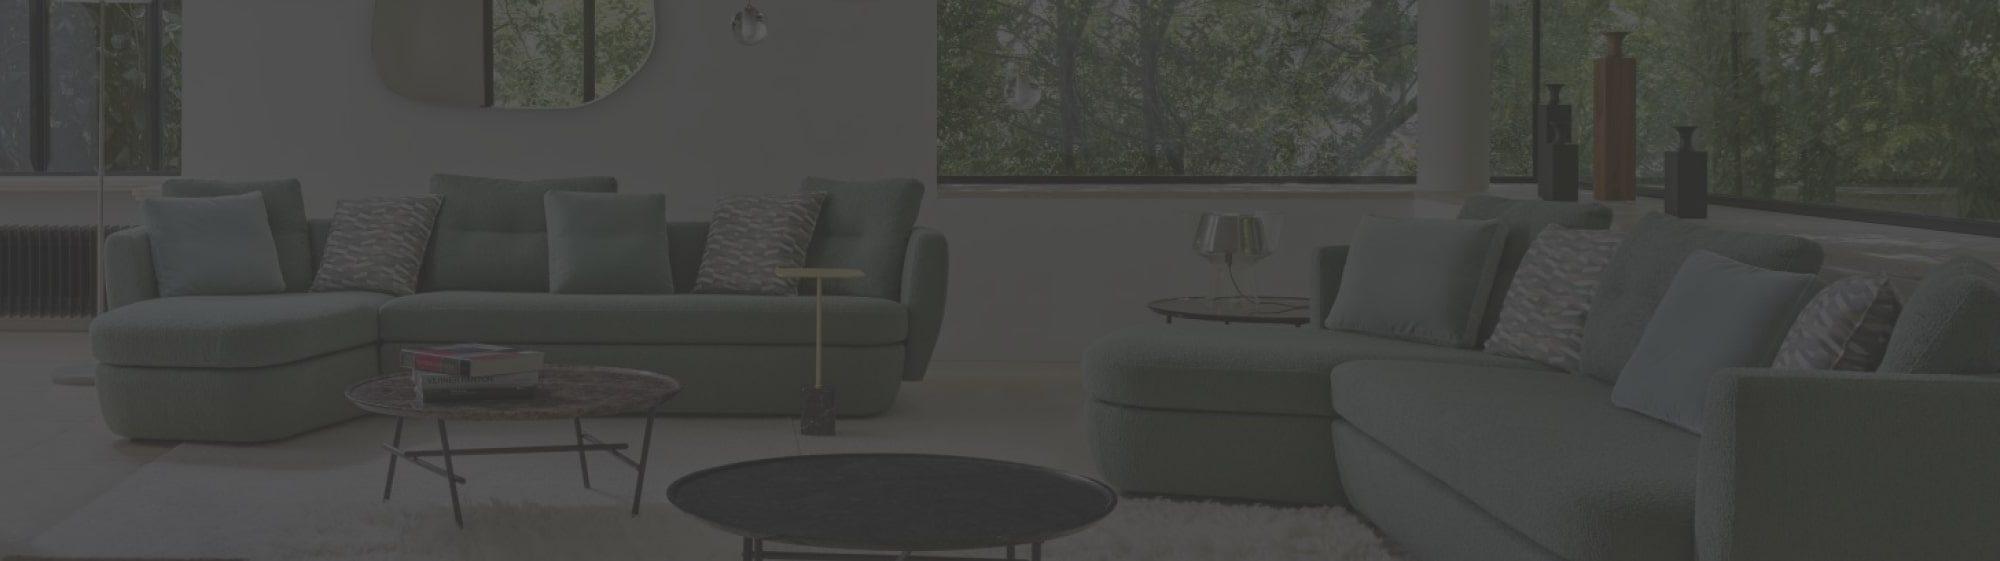 kooku-design-header